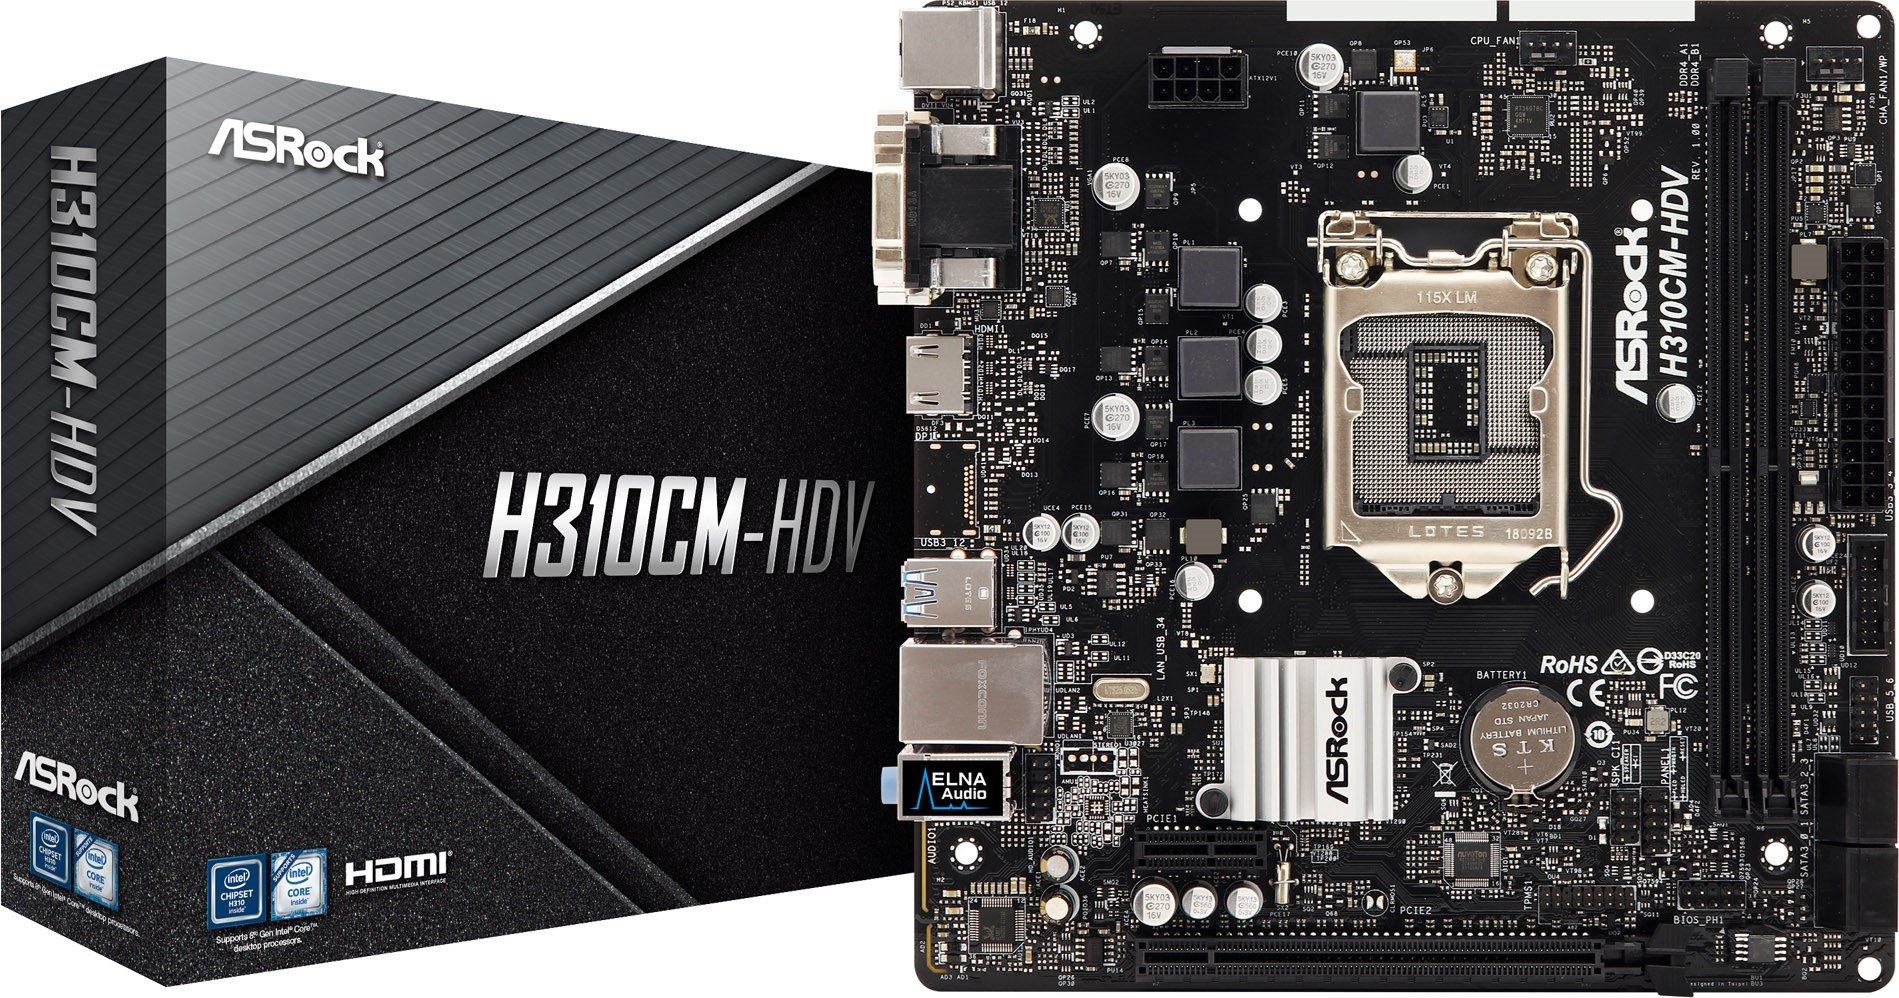 ASRock H310CM-HDV Intel Socket 1151 Motherboard £52.44 at CCLOnline